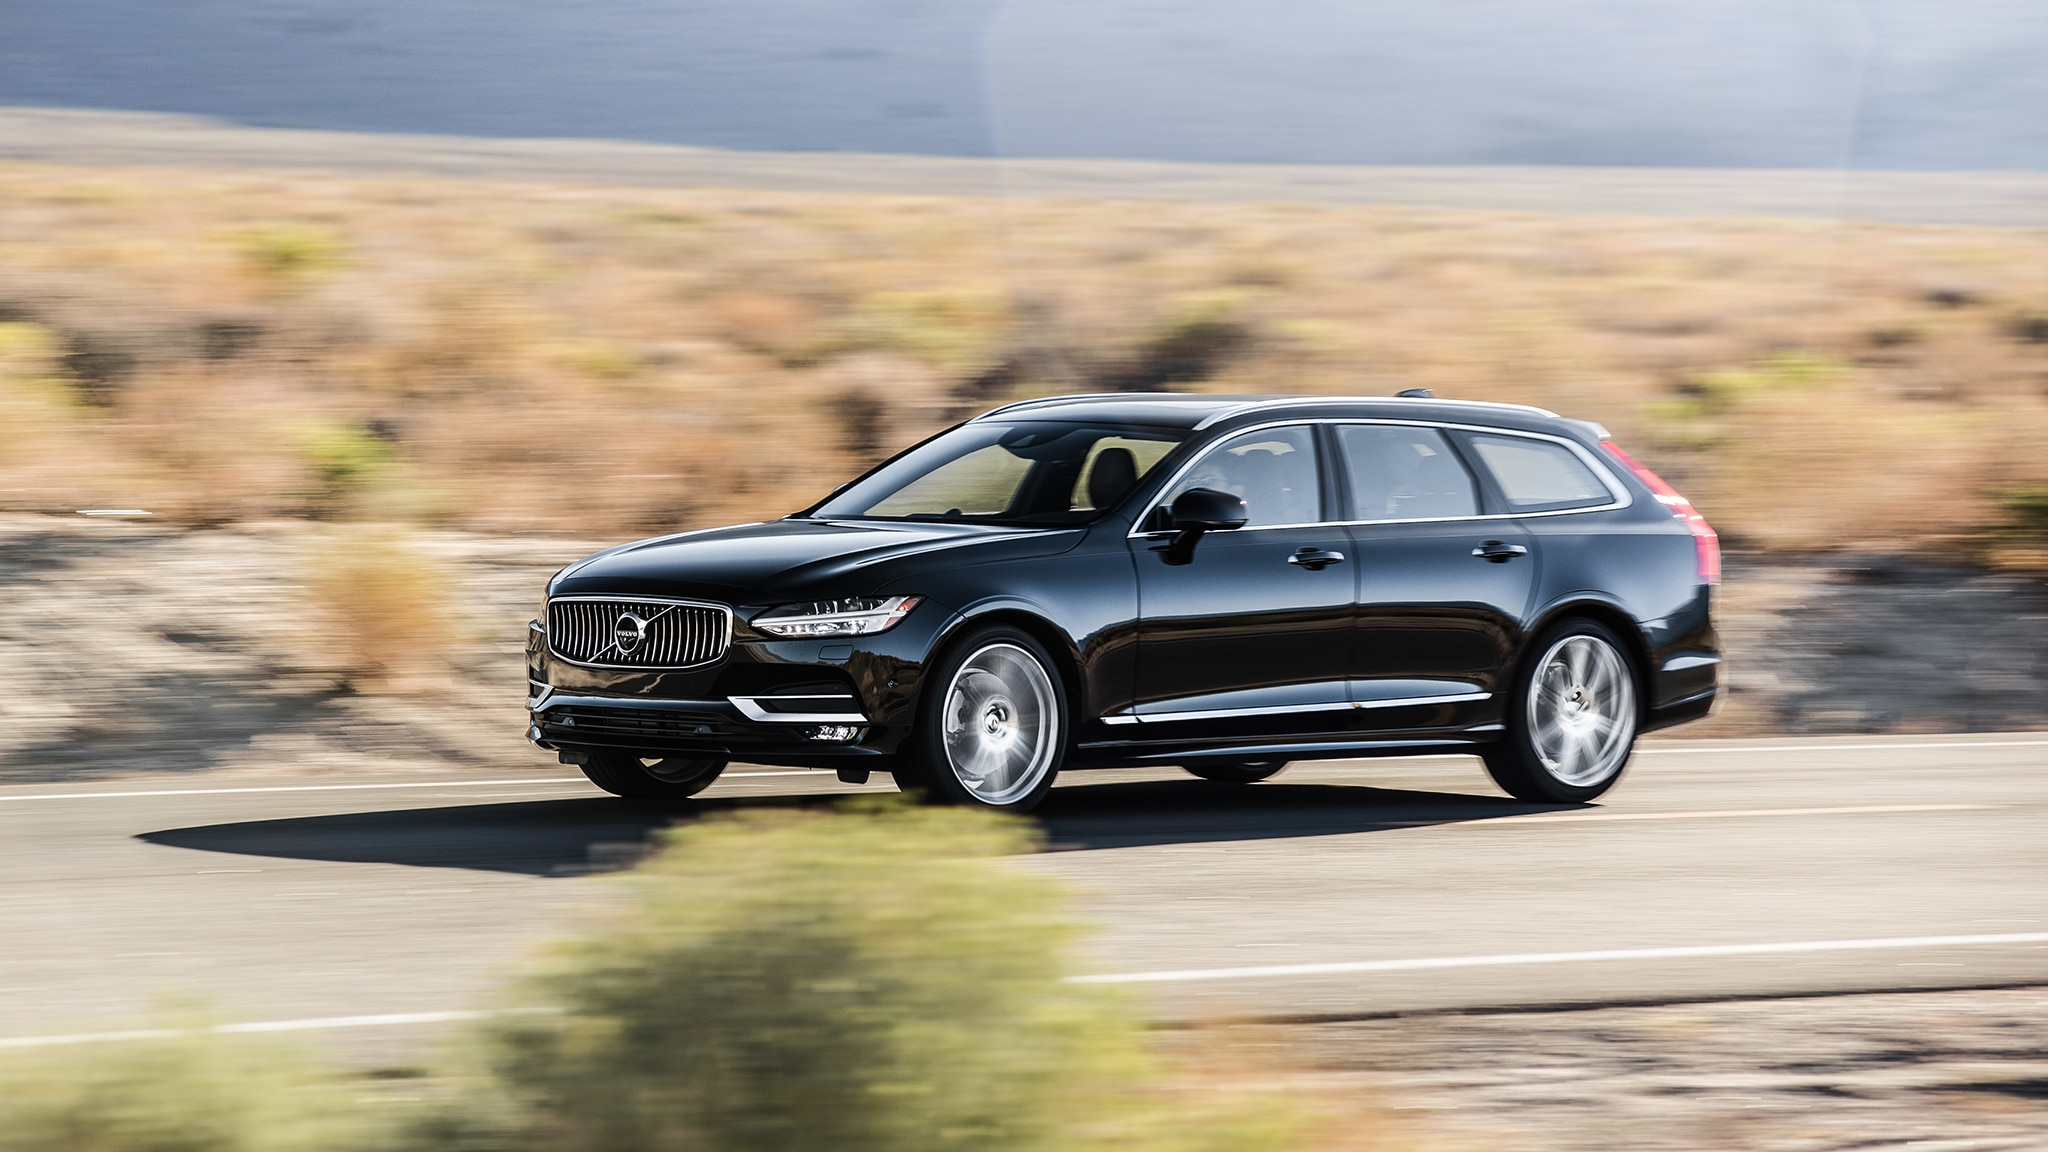 2019 Volvo V90 Long-Term Update: More Bad Luck ...